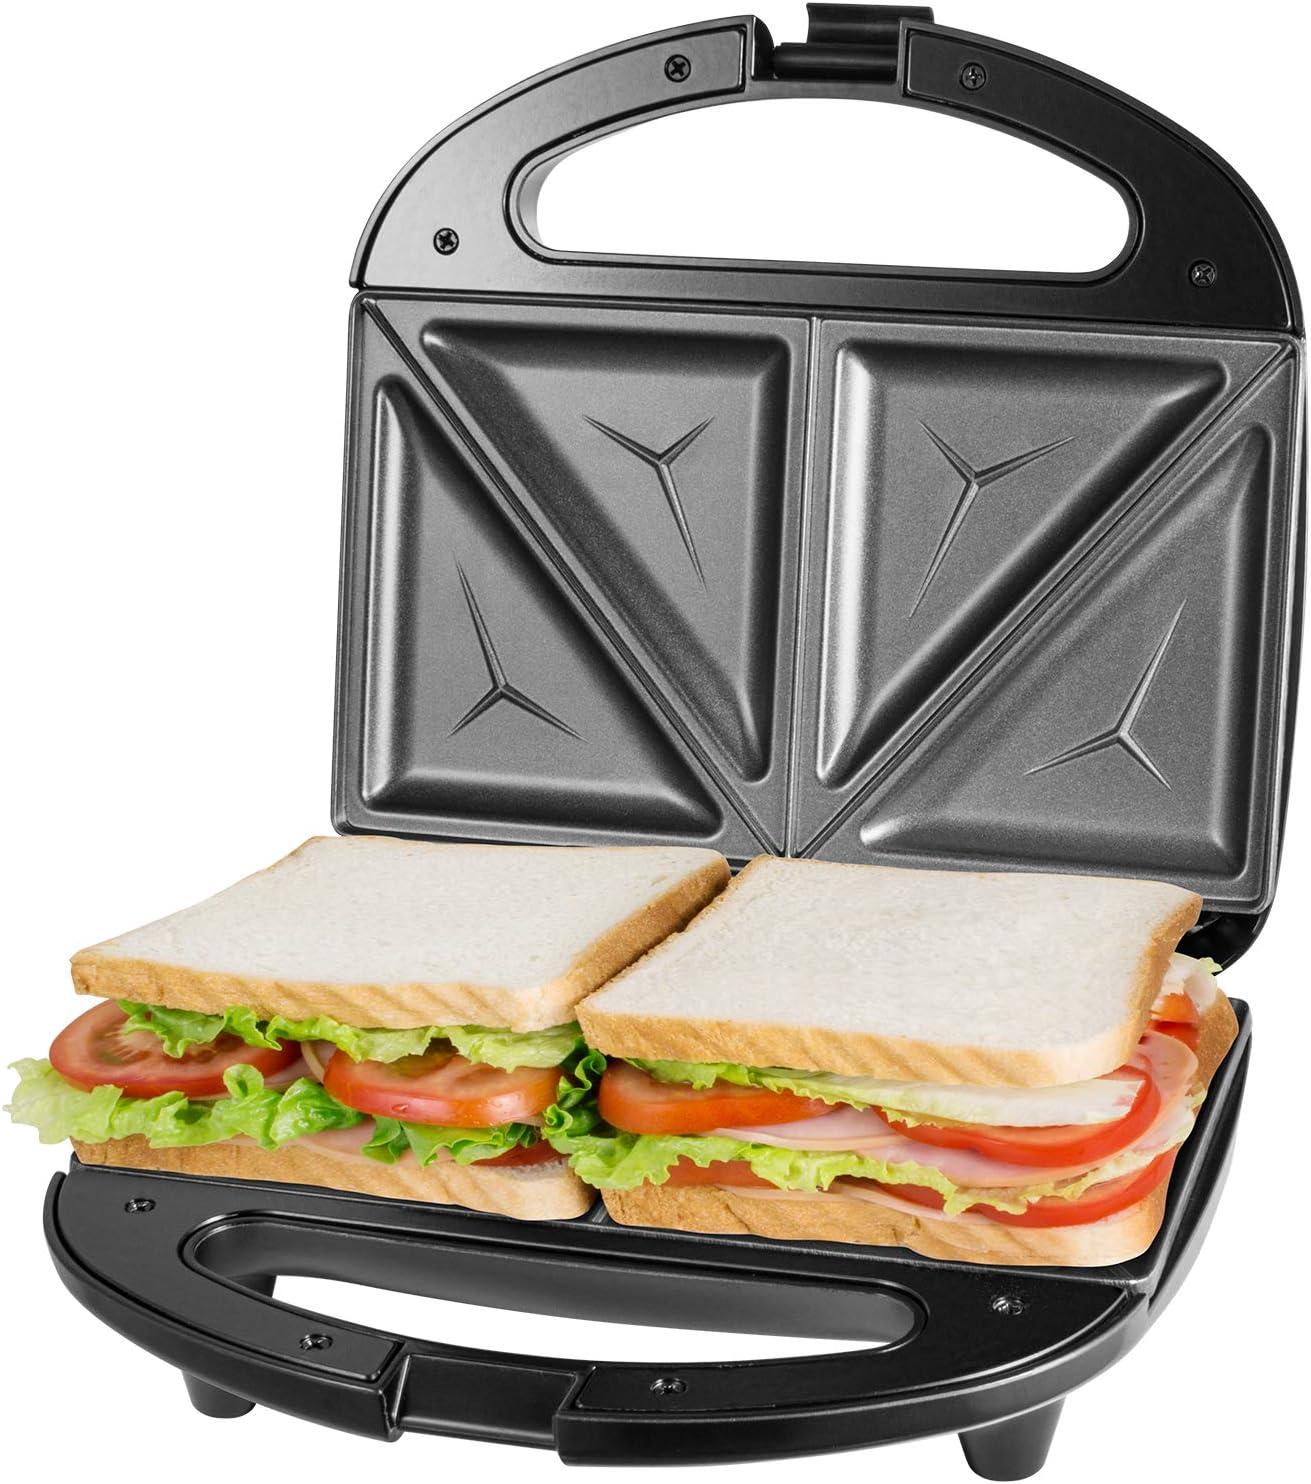 Sandwichera antiadherente 750W acero inoxidable